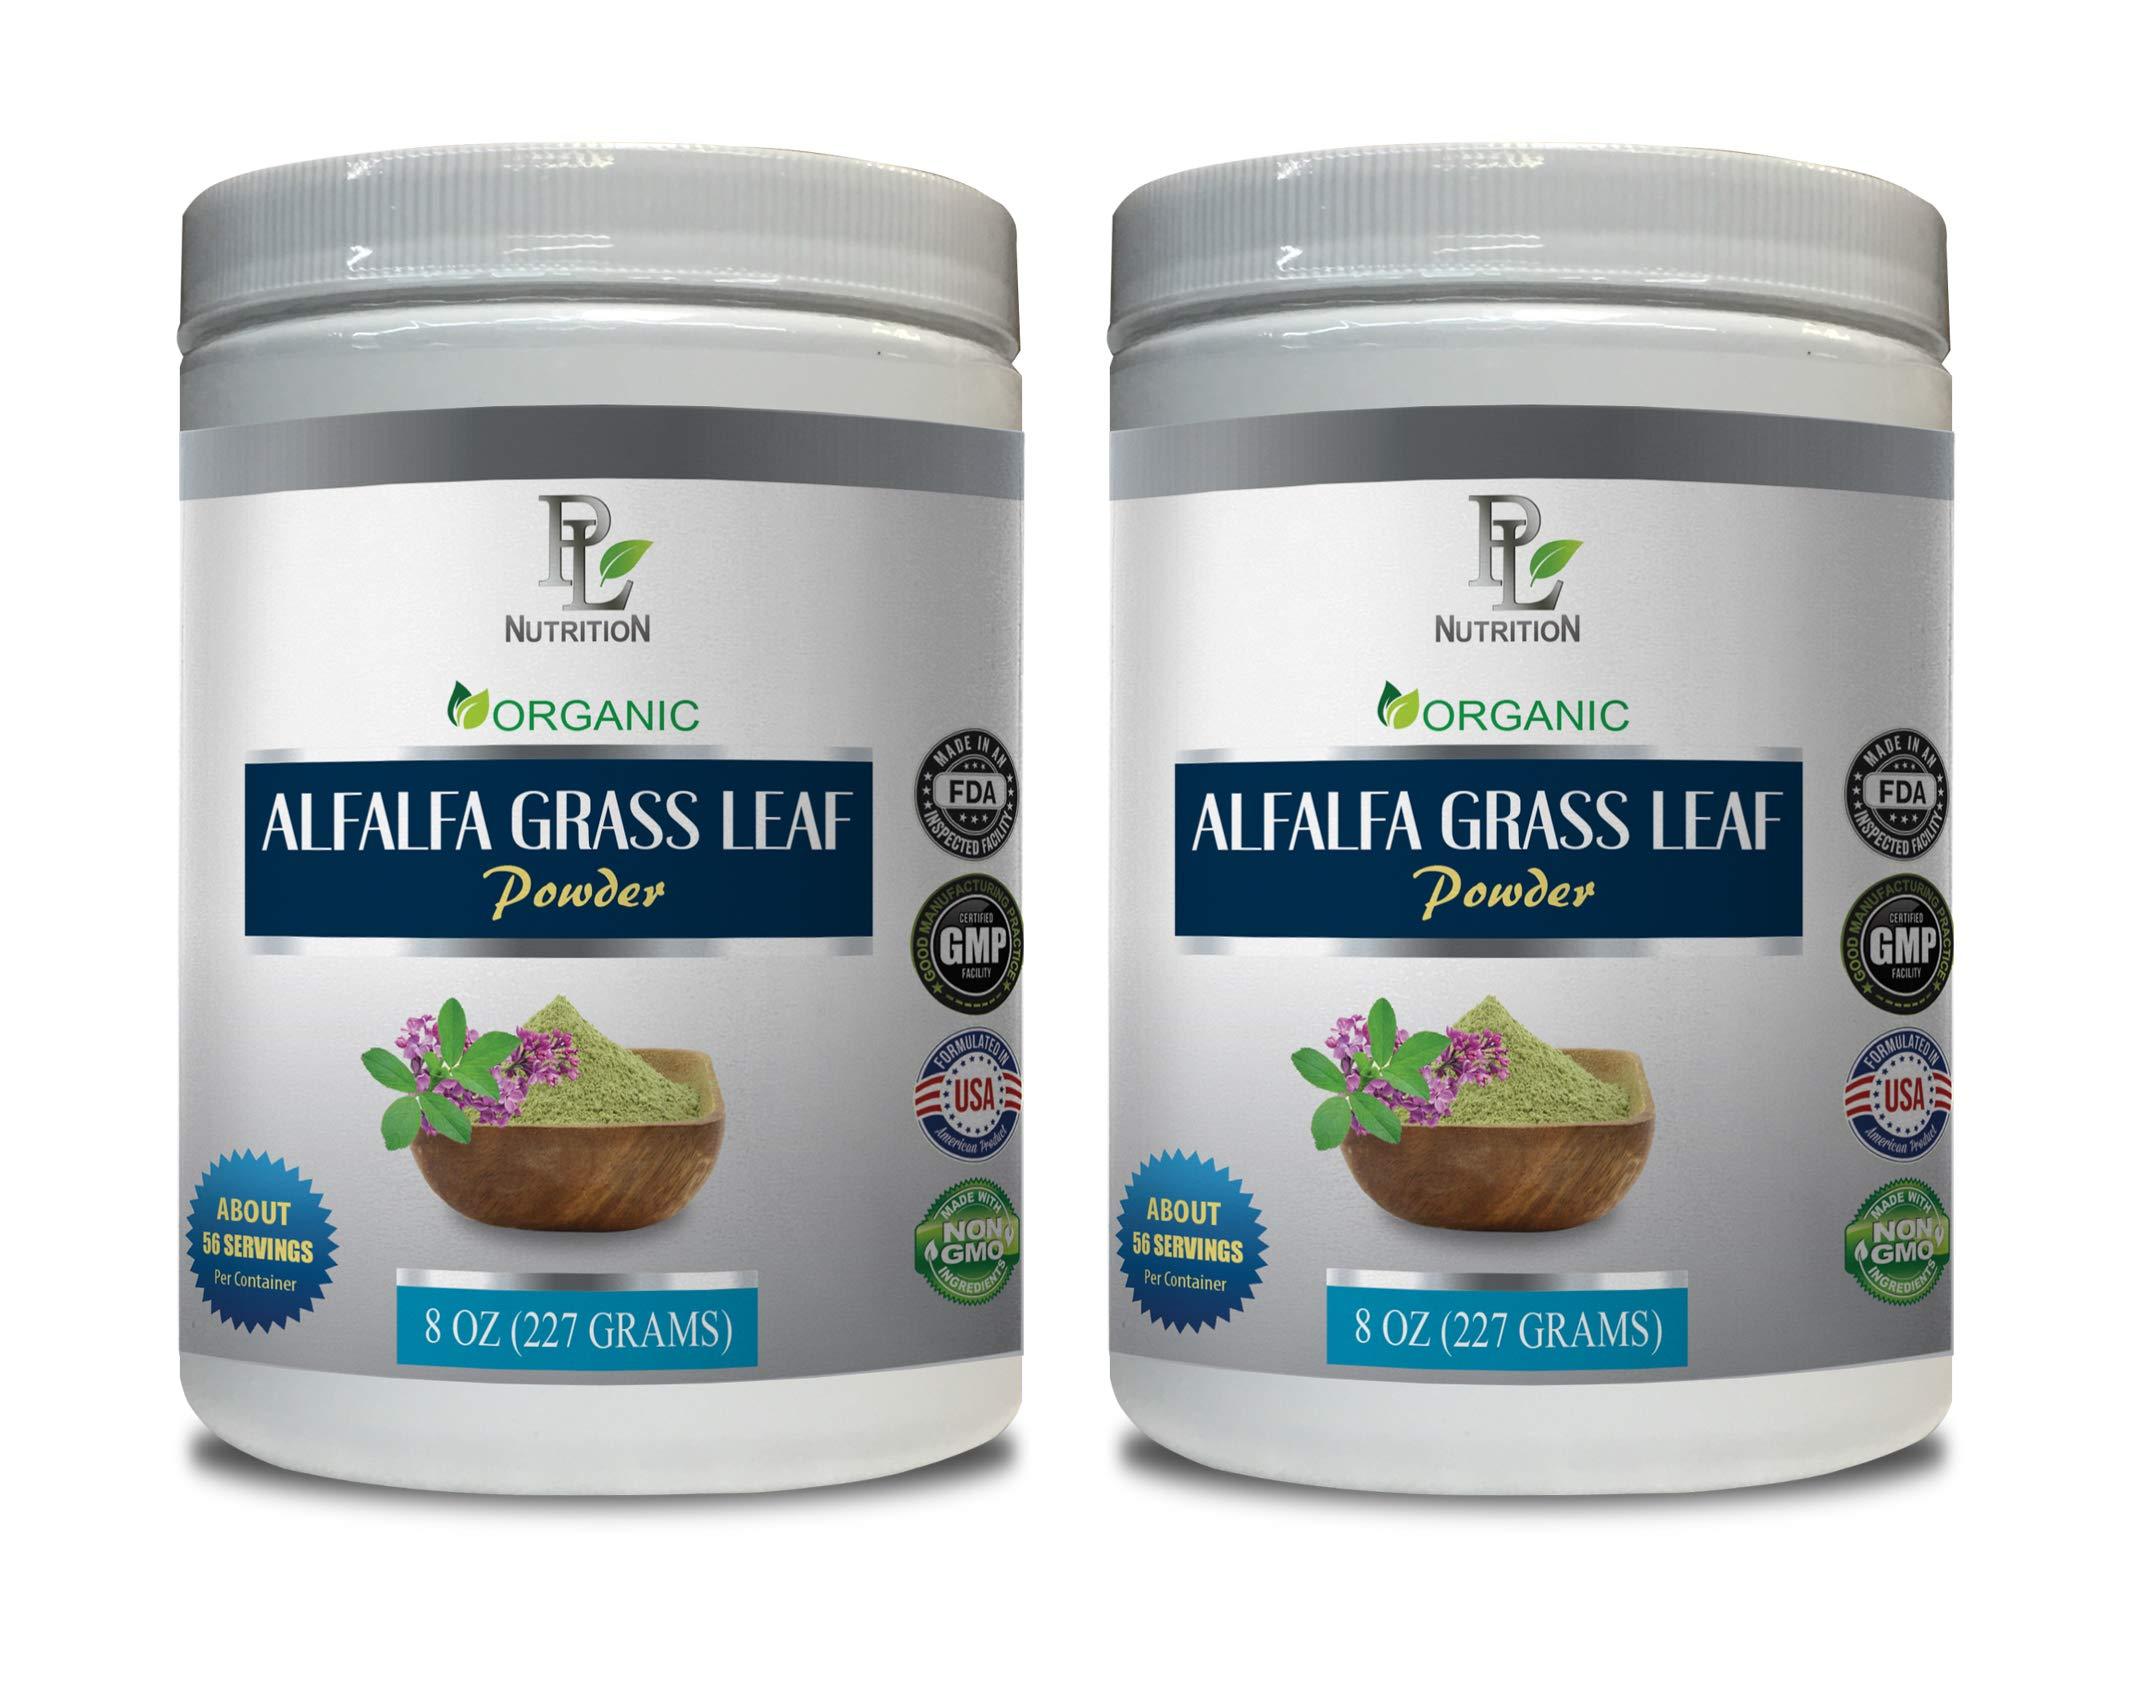 Blood Pressure Vitamin Supplements - Alfalfa Grass Leaf Organic Powder - Alfalfa Leaf Organic - 2 Cans 16 OZ (112 Servings)